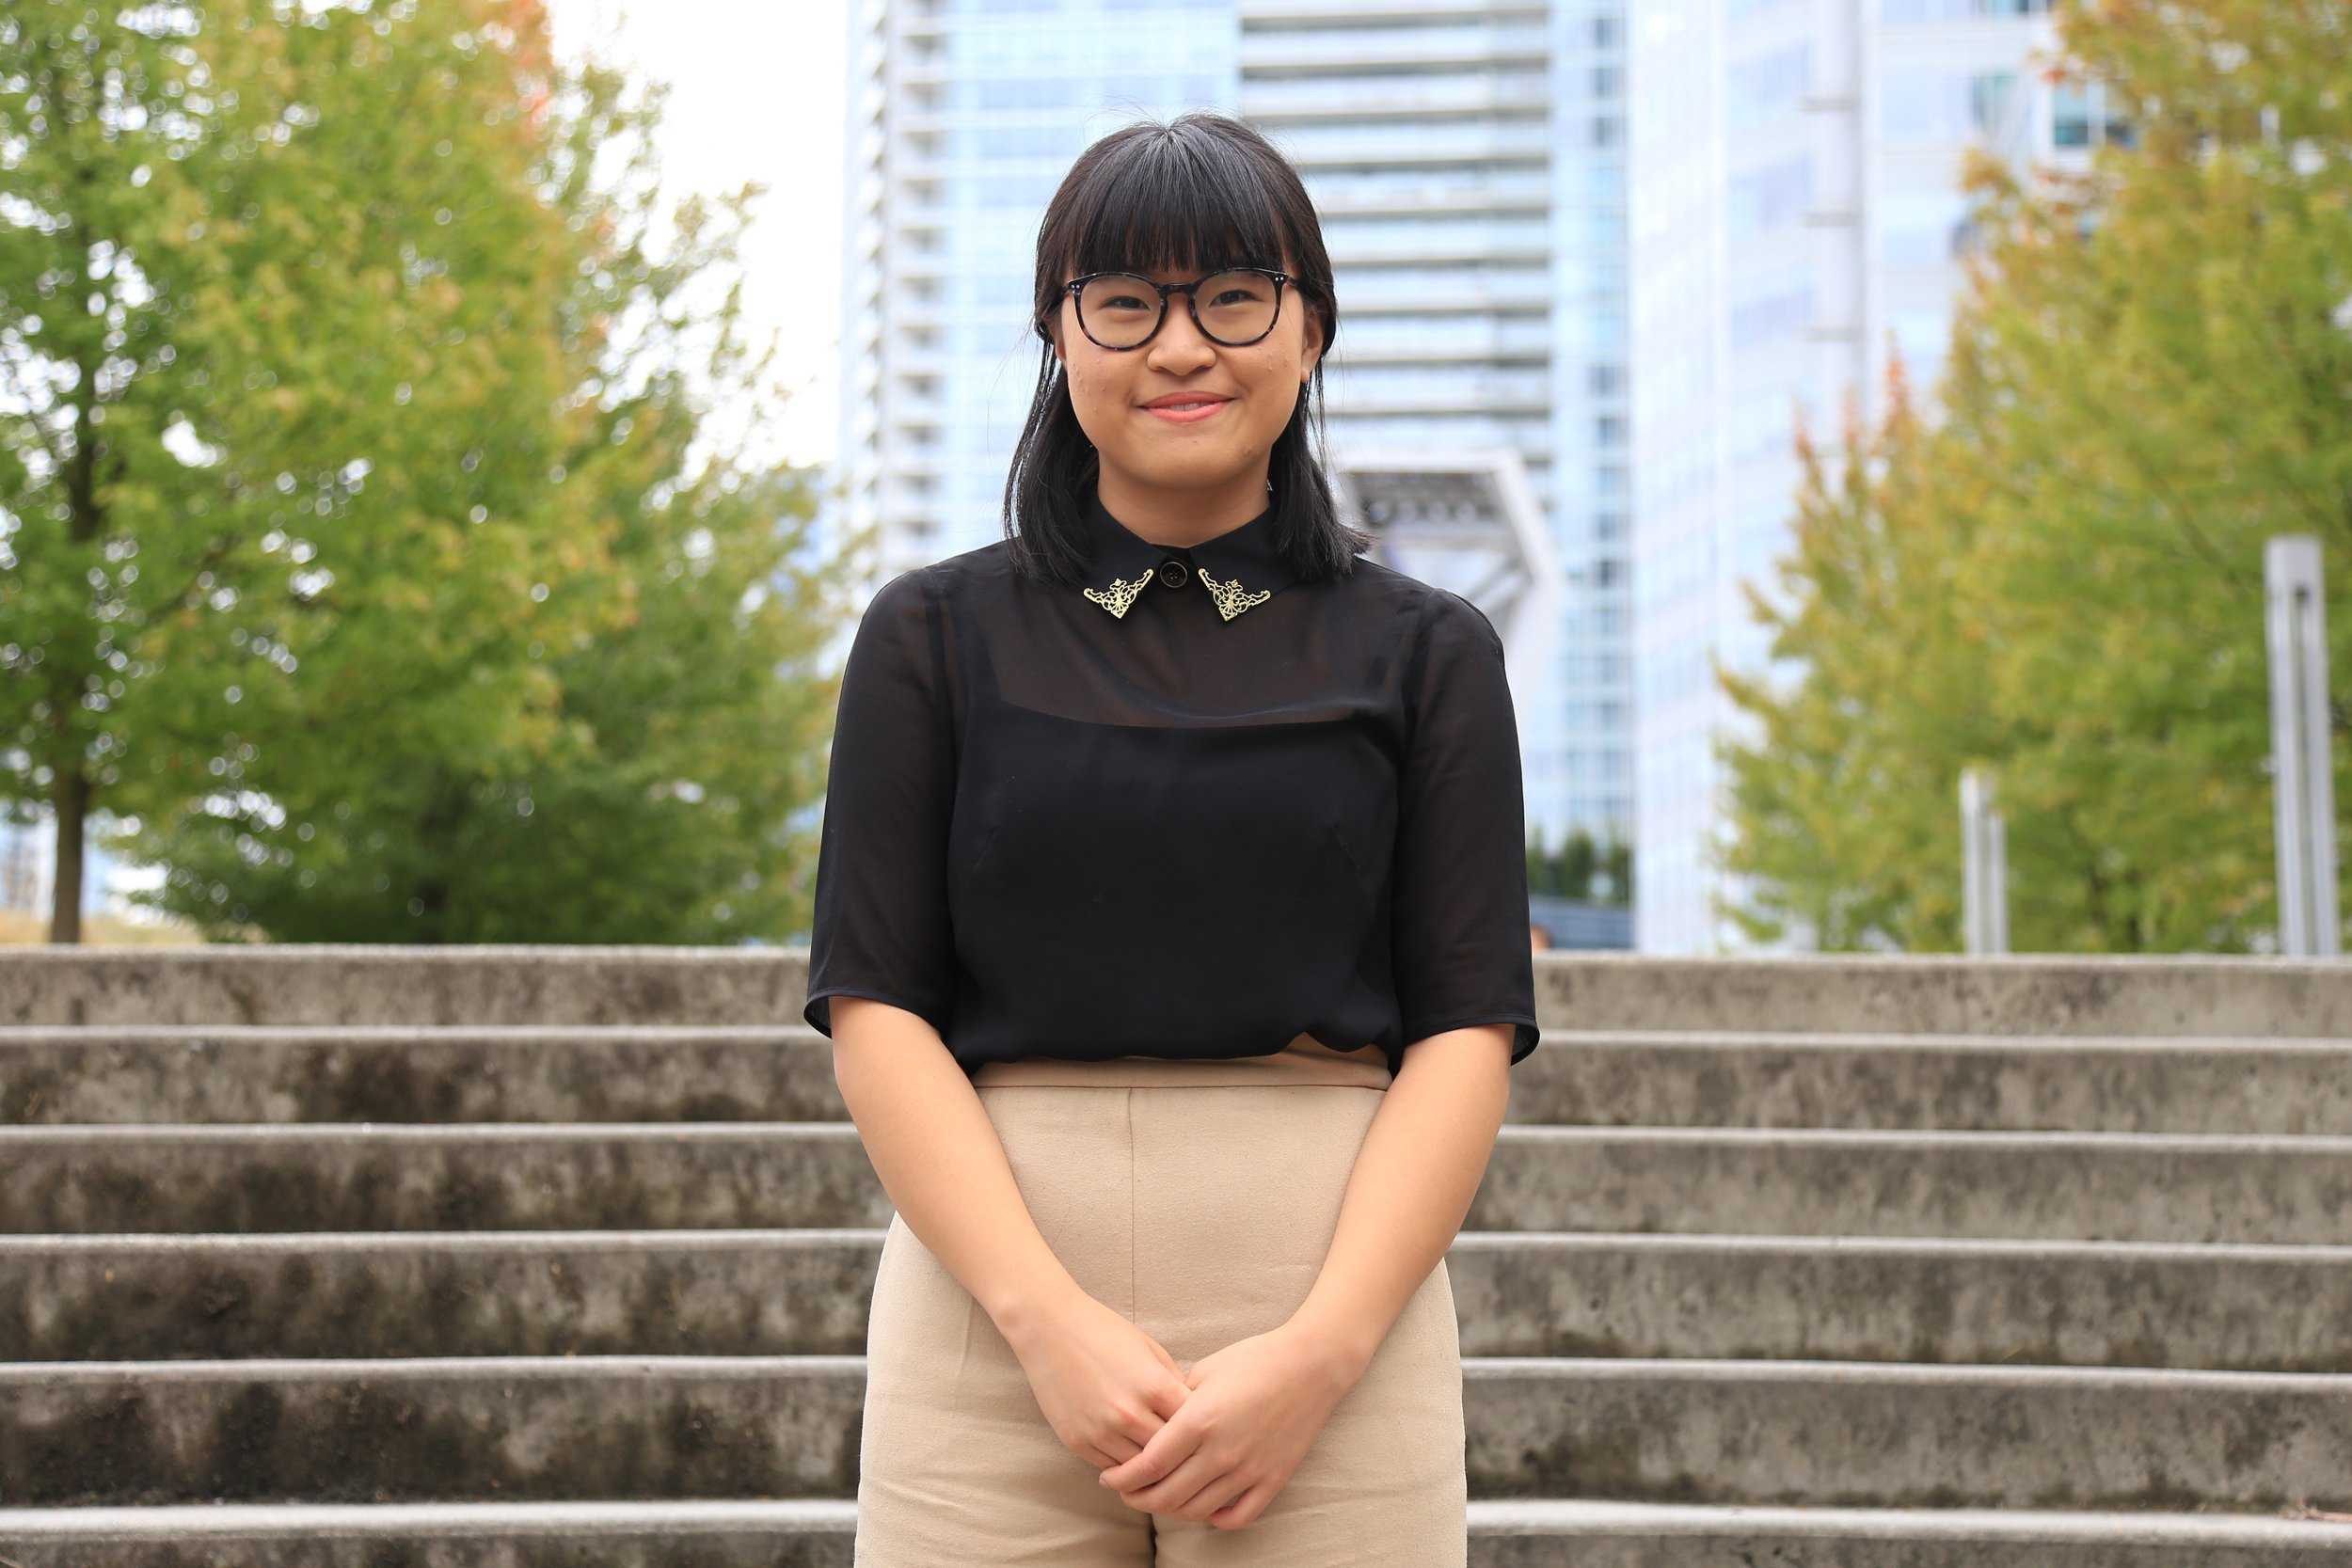 Marketing Director - Emily He